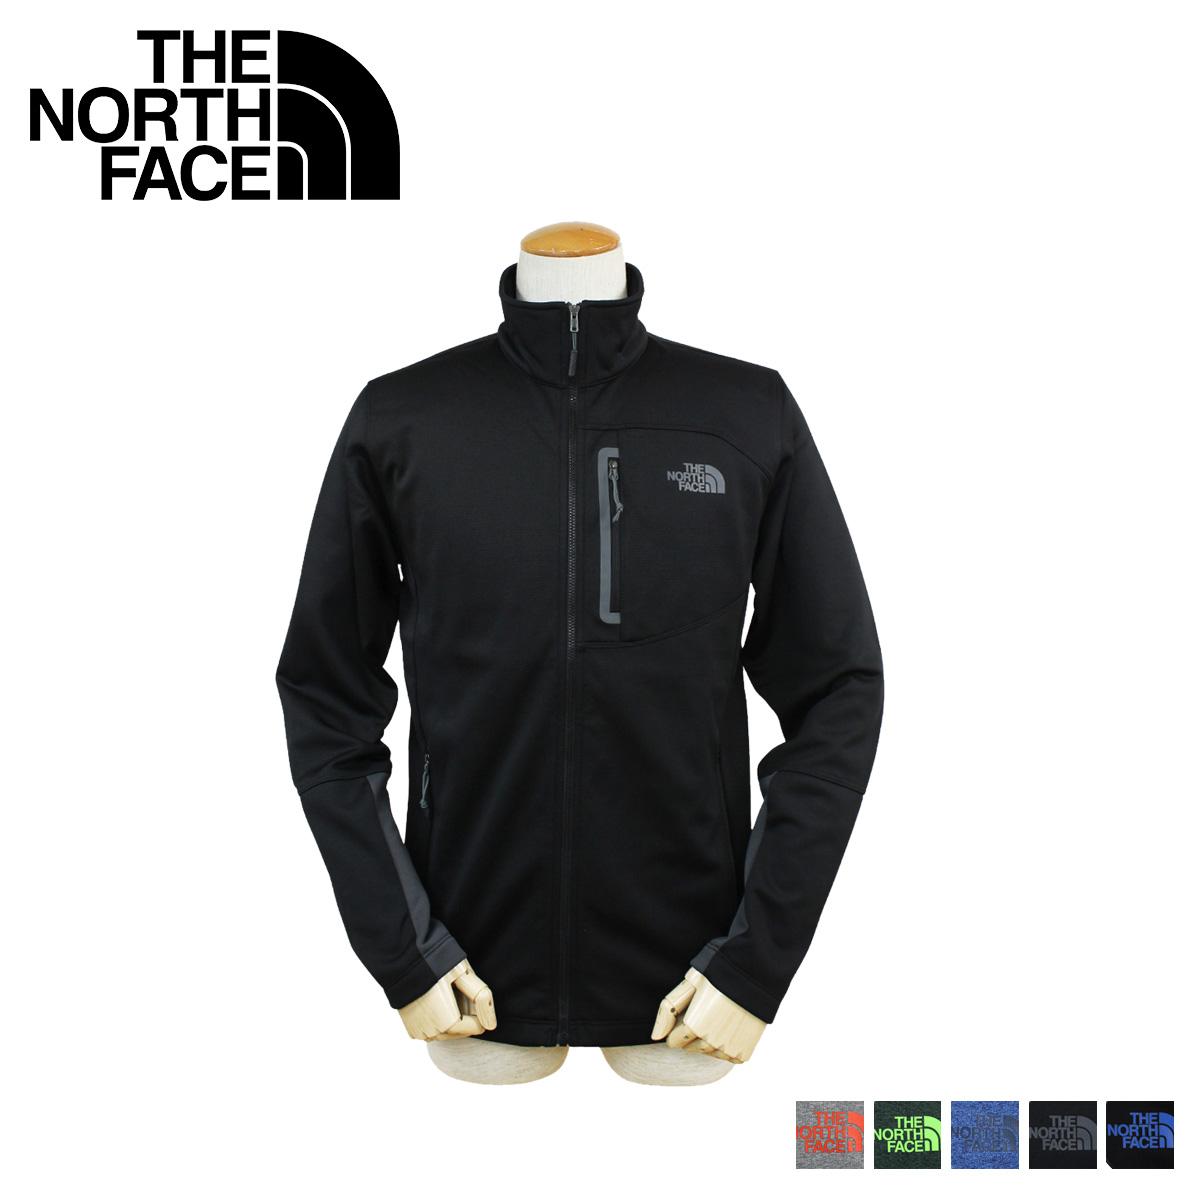 9f33329e8 North Face THE NORTH FACE fleece jacket MEN'S CANYONLANDS FULL ZIP men